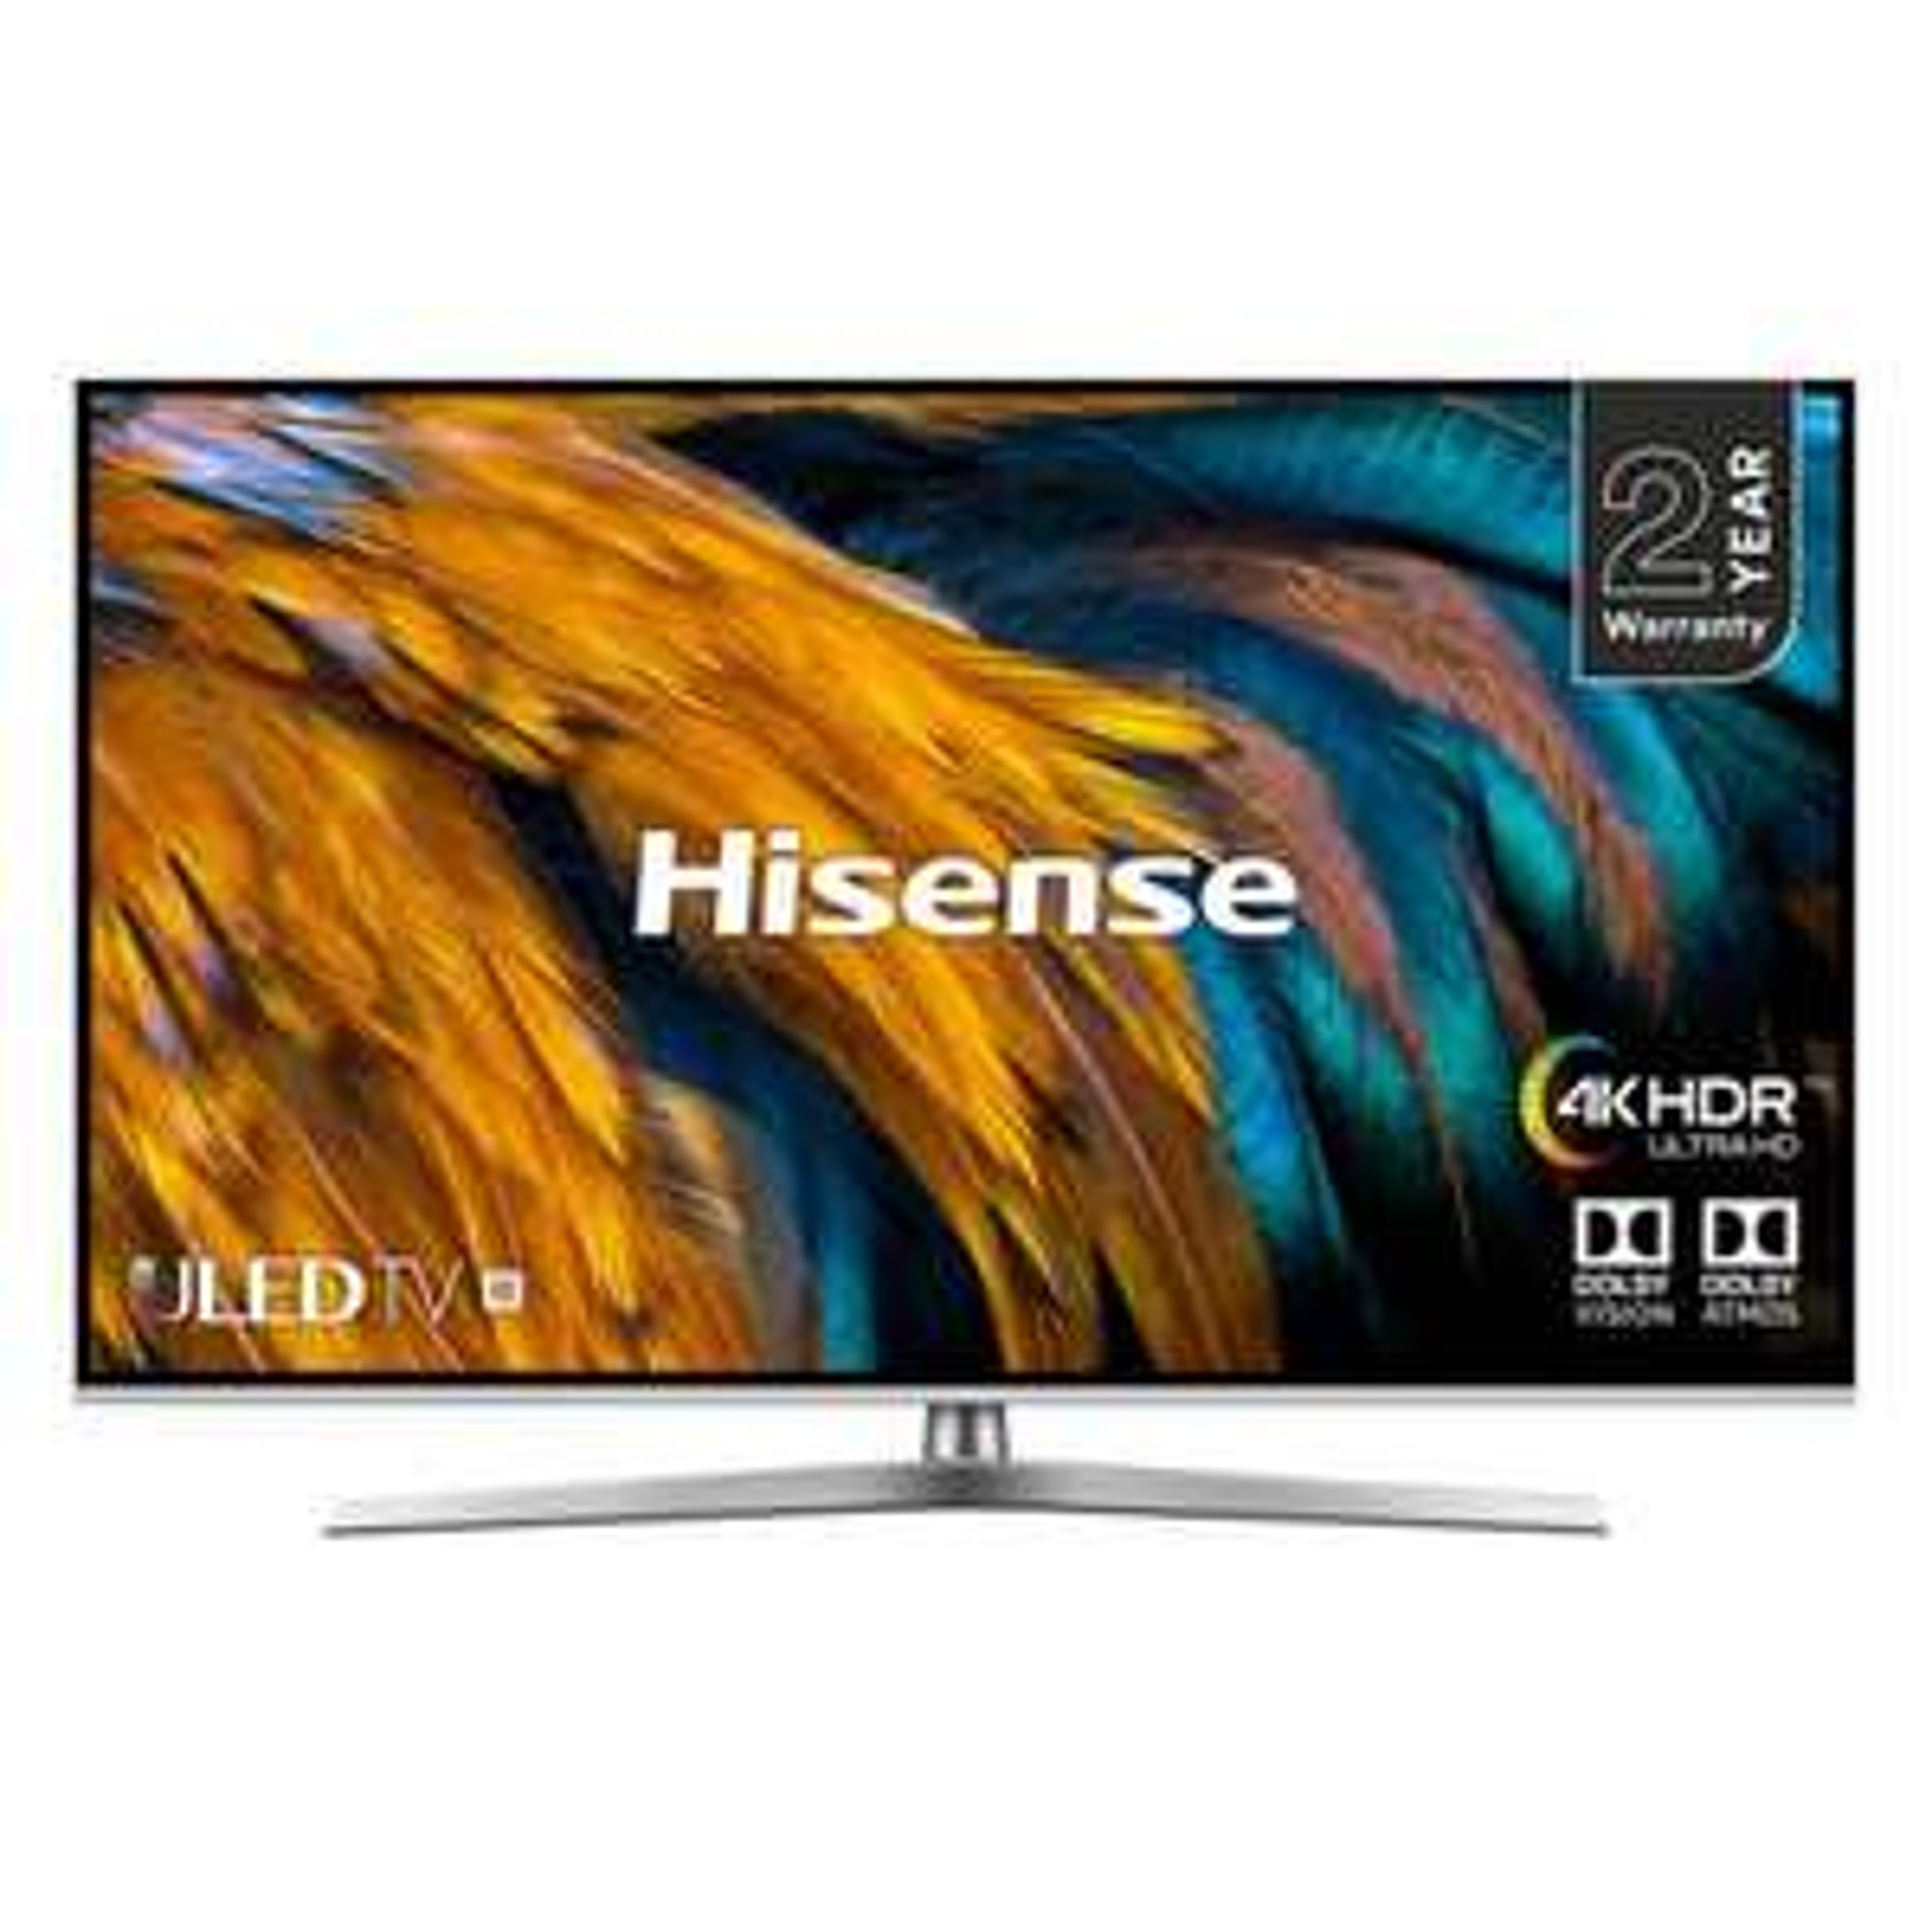 "Hisense H50U7BUK 50"" 4K HDR ULED Smart TV Dolby Atmos , £384.00 with code @ Hughes"